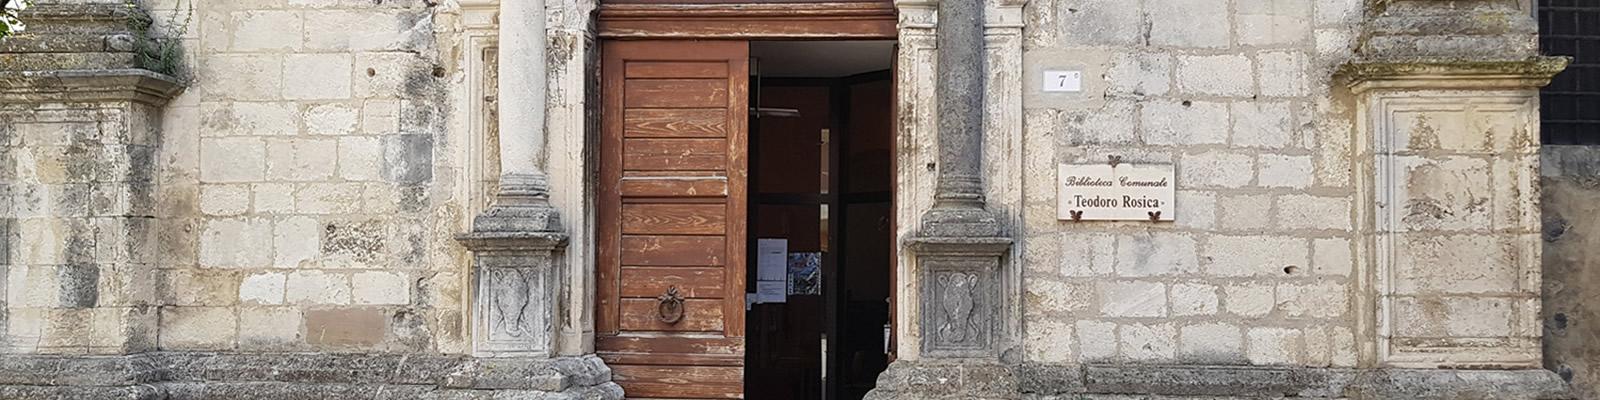 Biblioteca Comunale 'Teodoro Rosica' di Guardiagrele